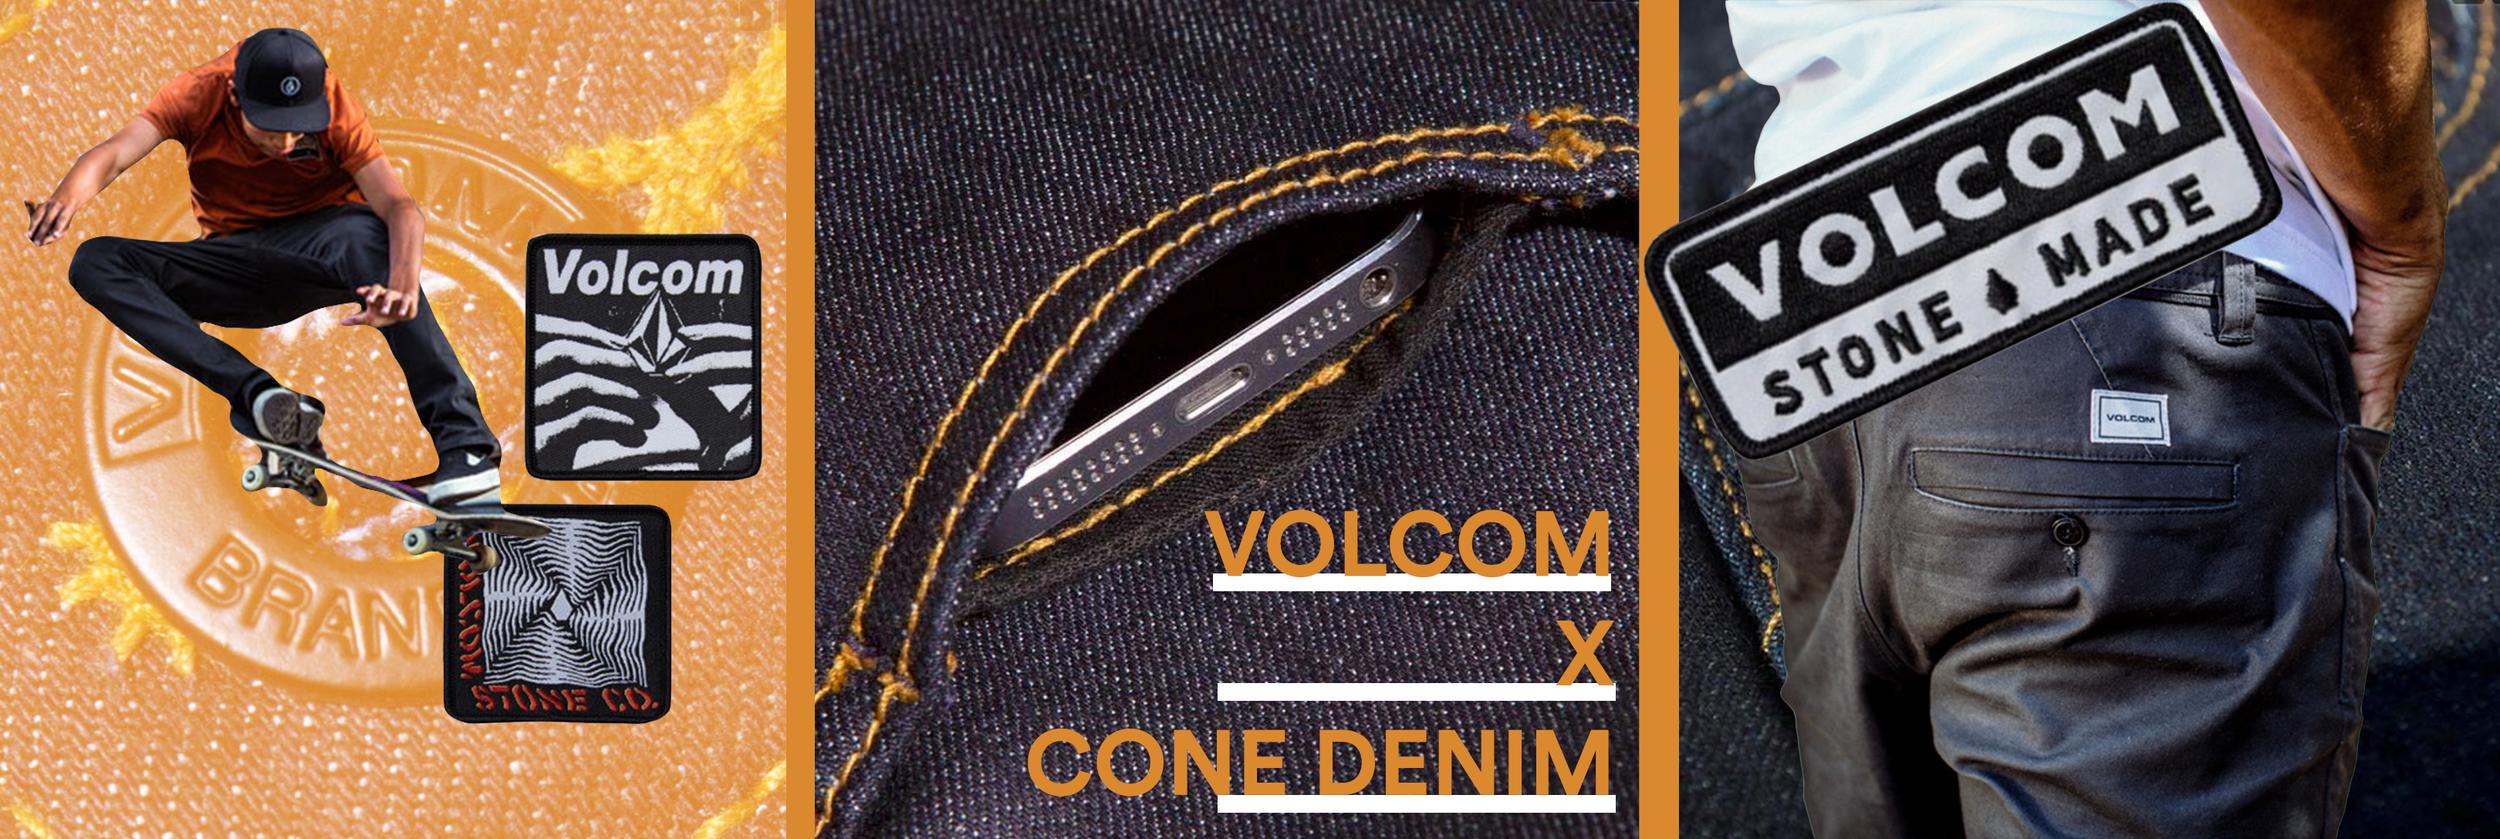 Volcom X Cone Denim Mills